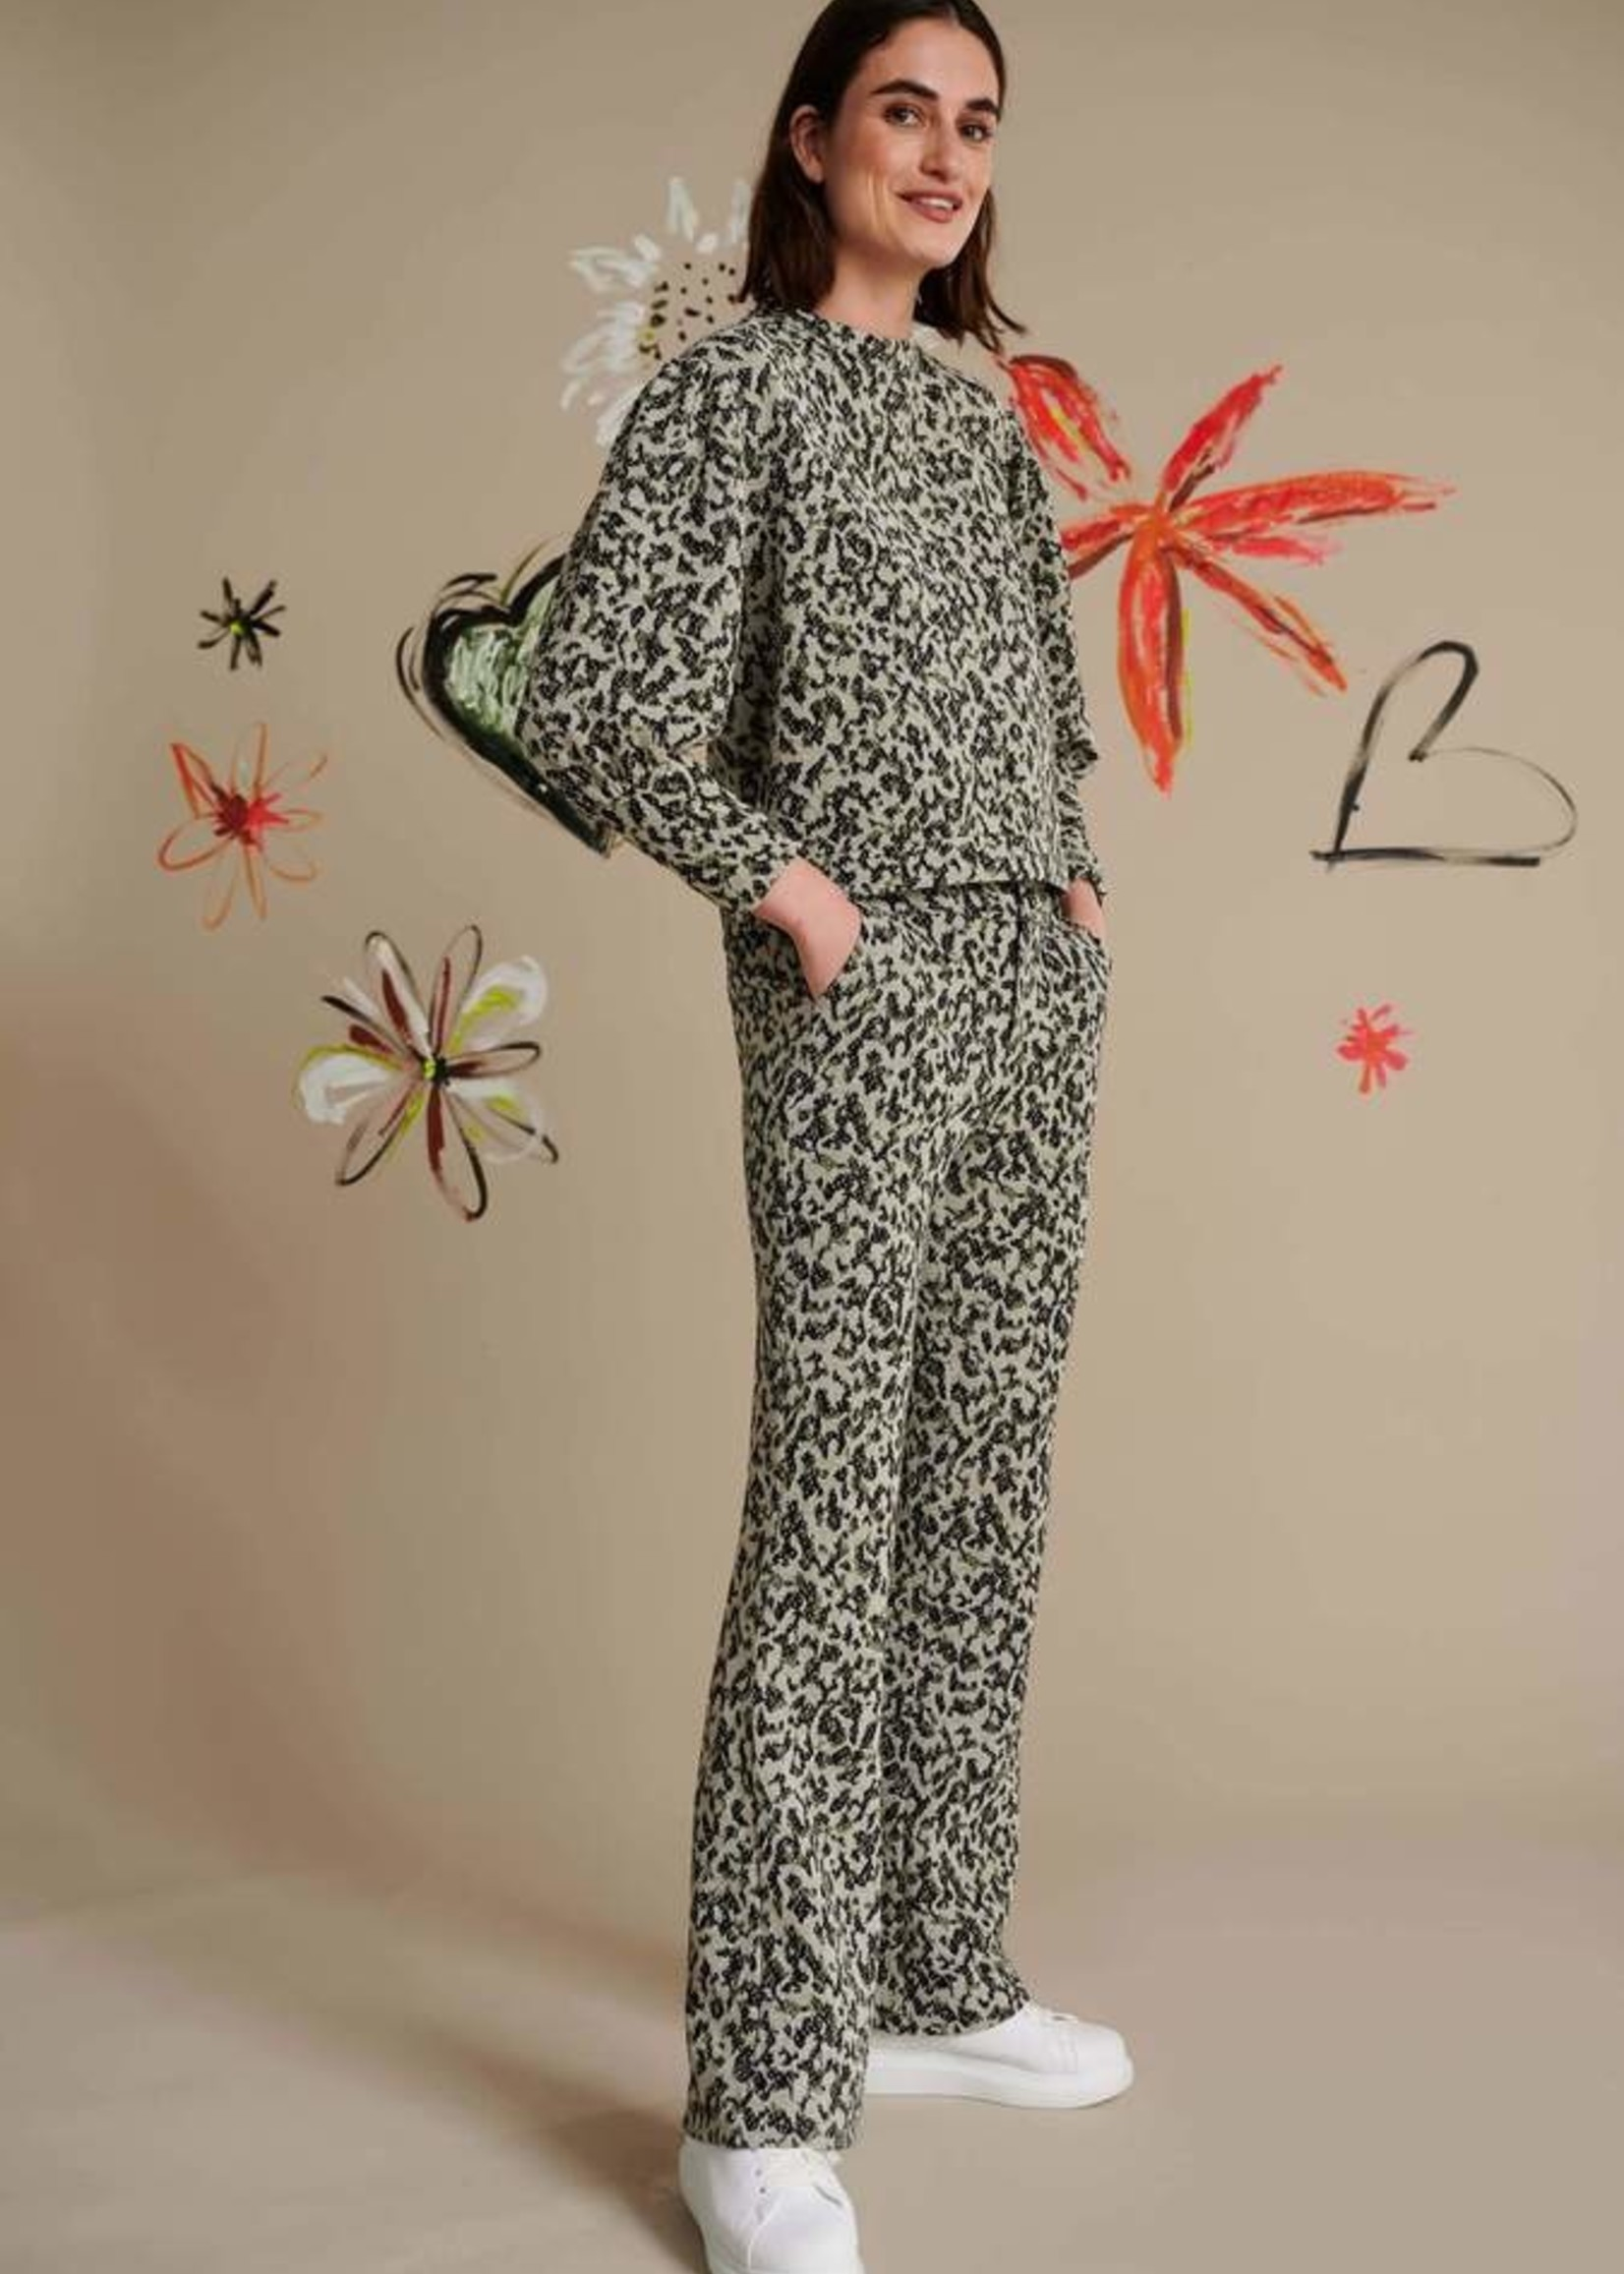 Pom Amsterdam Pants - Kate Khaki Green Shimmer